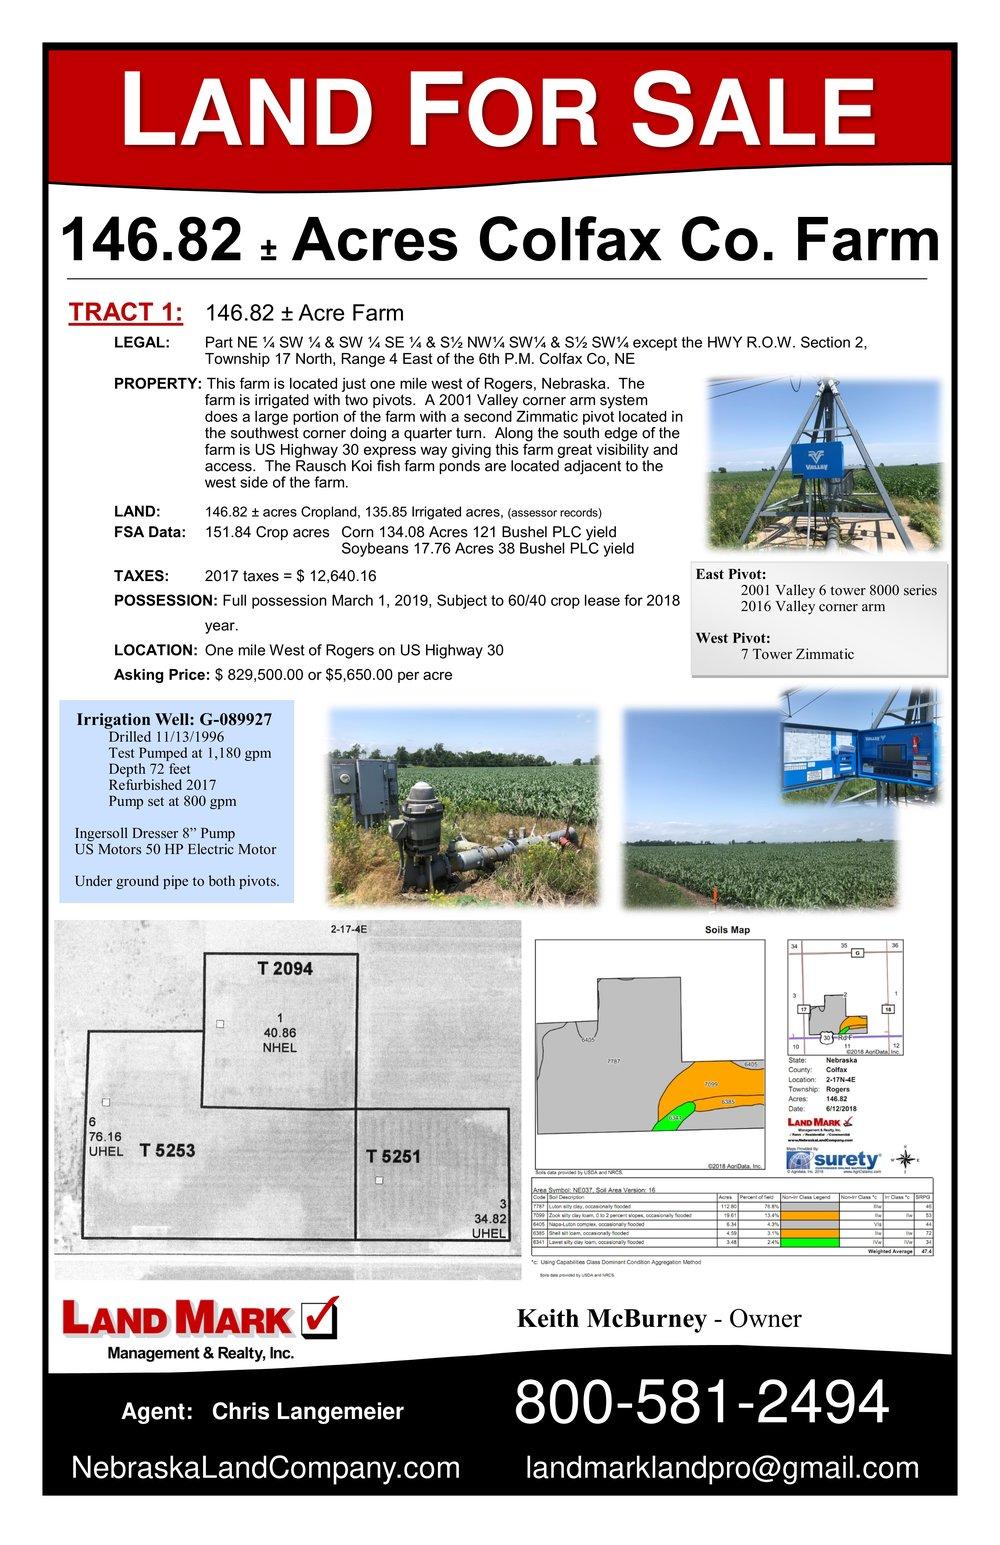 McBurney  Farm Colfax County Sale Bill 2018.jpg